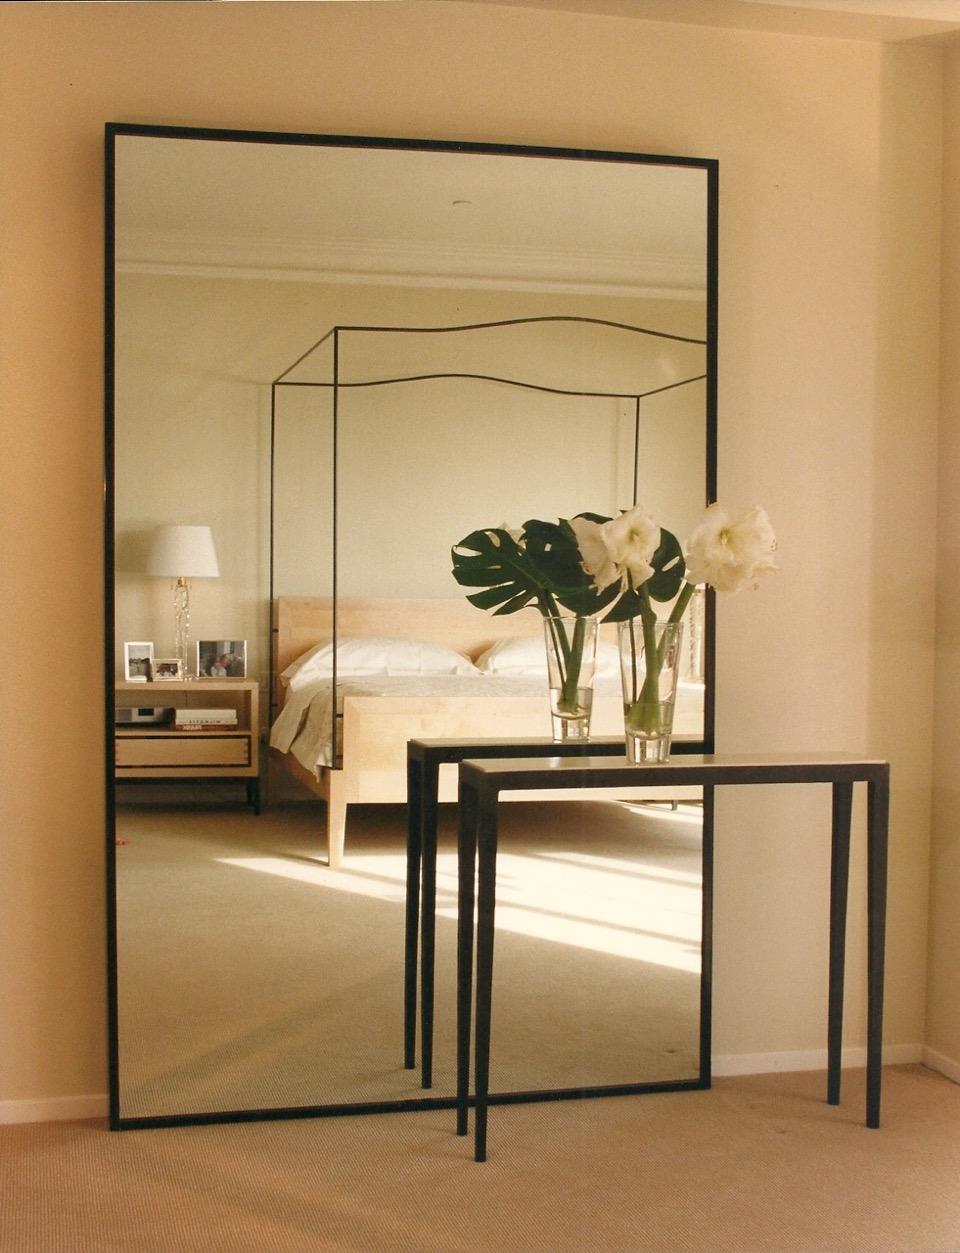 hosking master bedroom reflection.jpeg